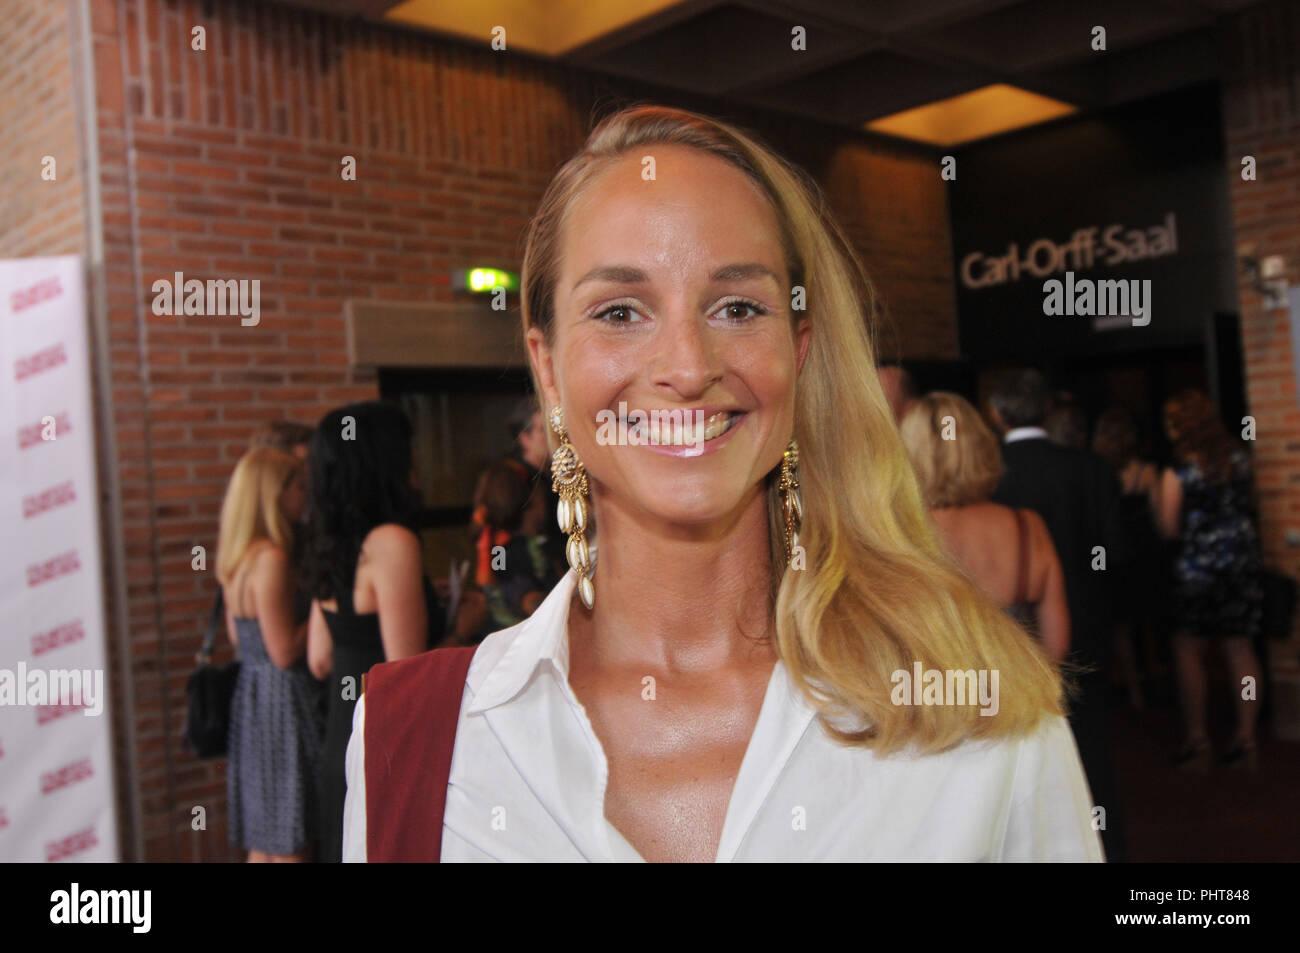 Lara-Joy Korner Nude Photos 18